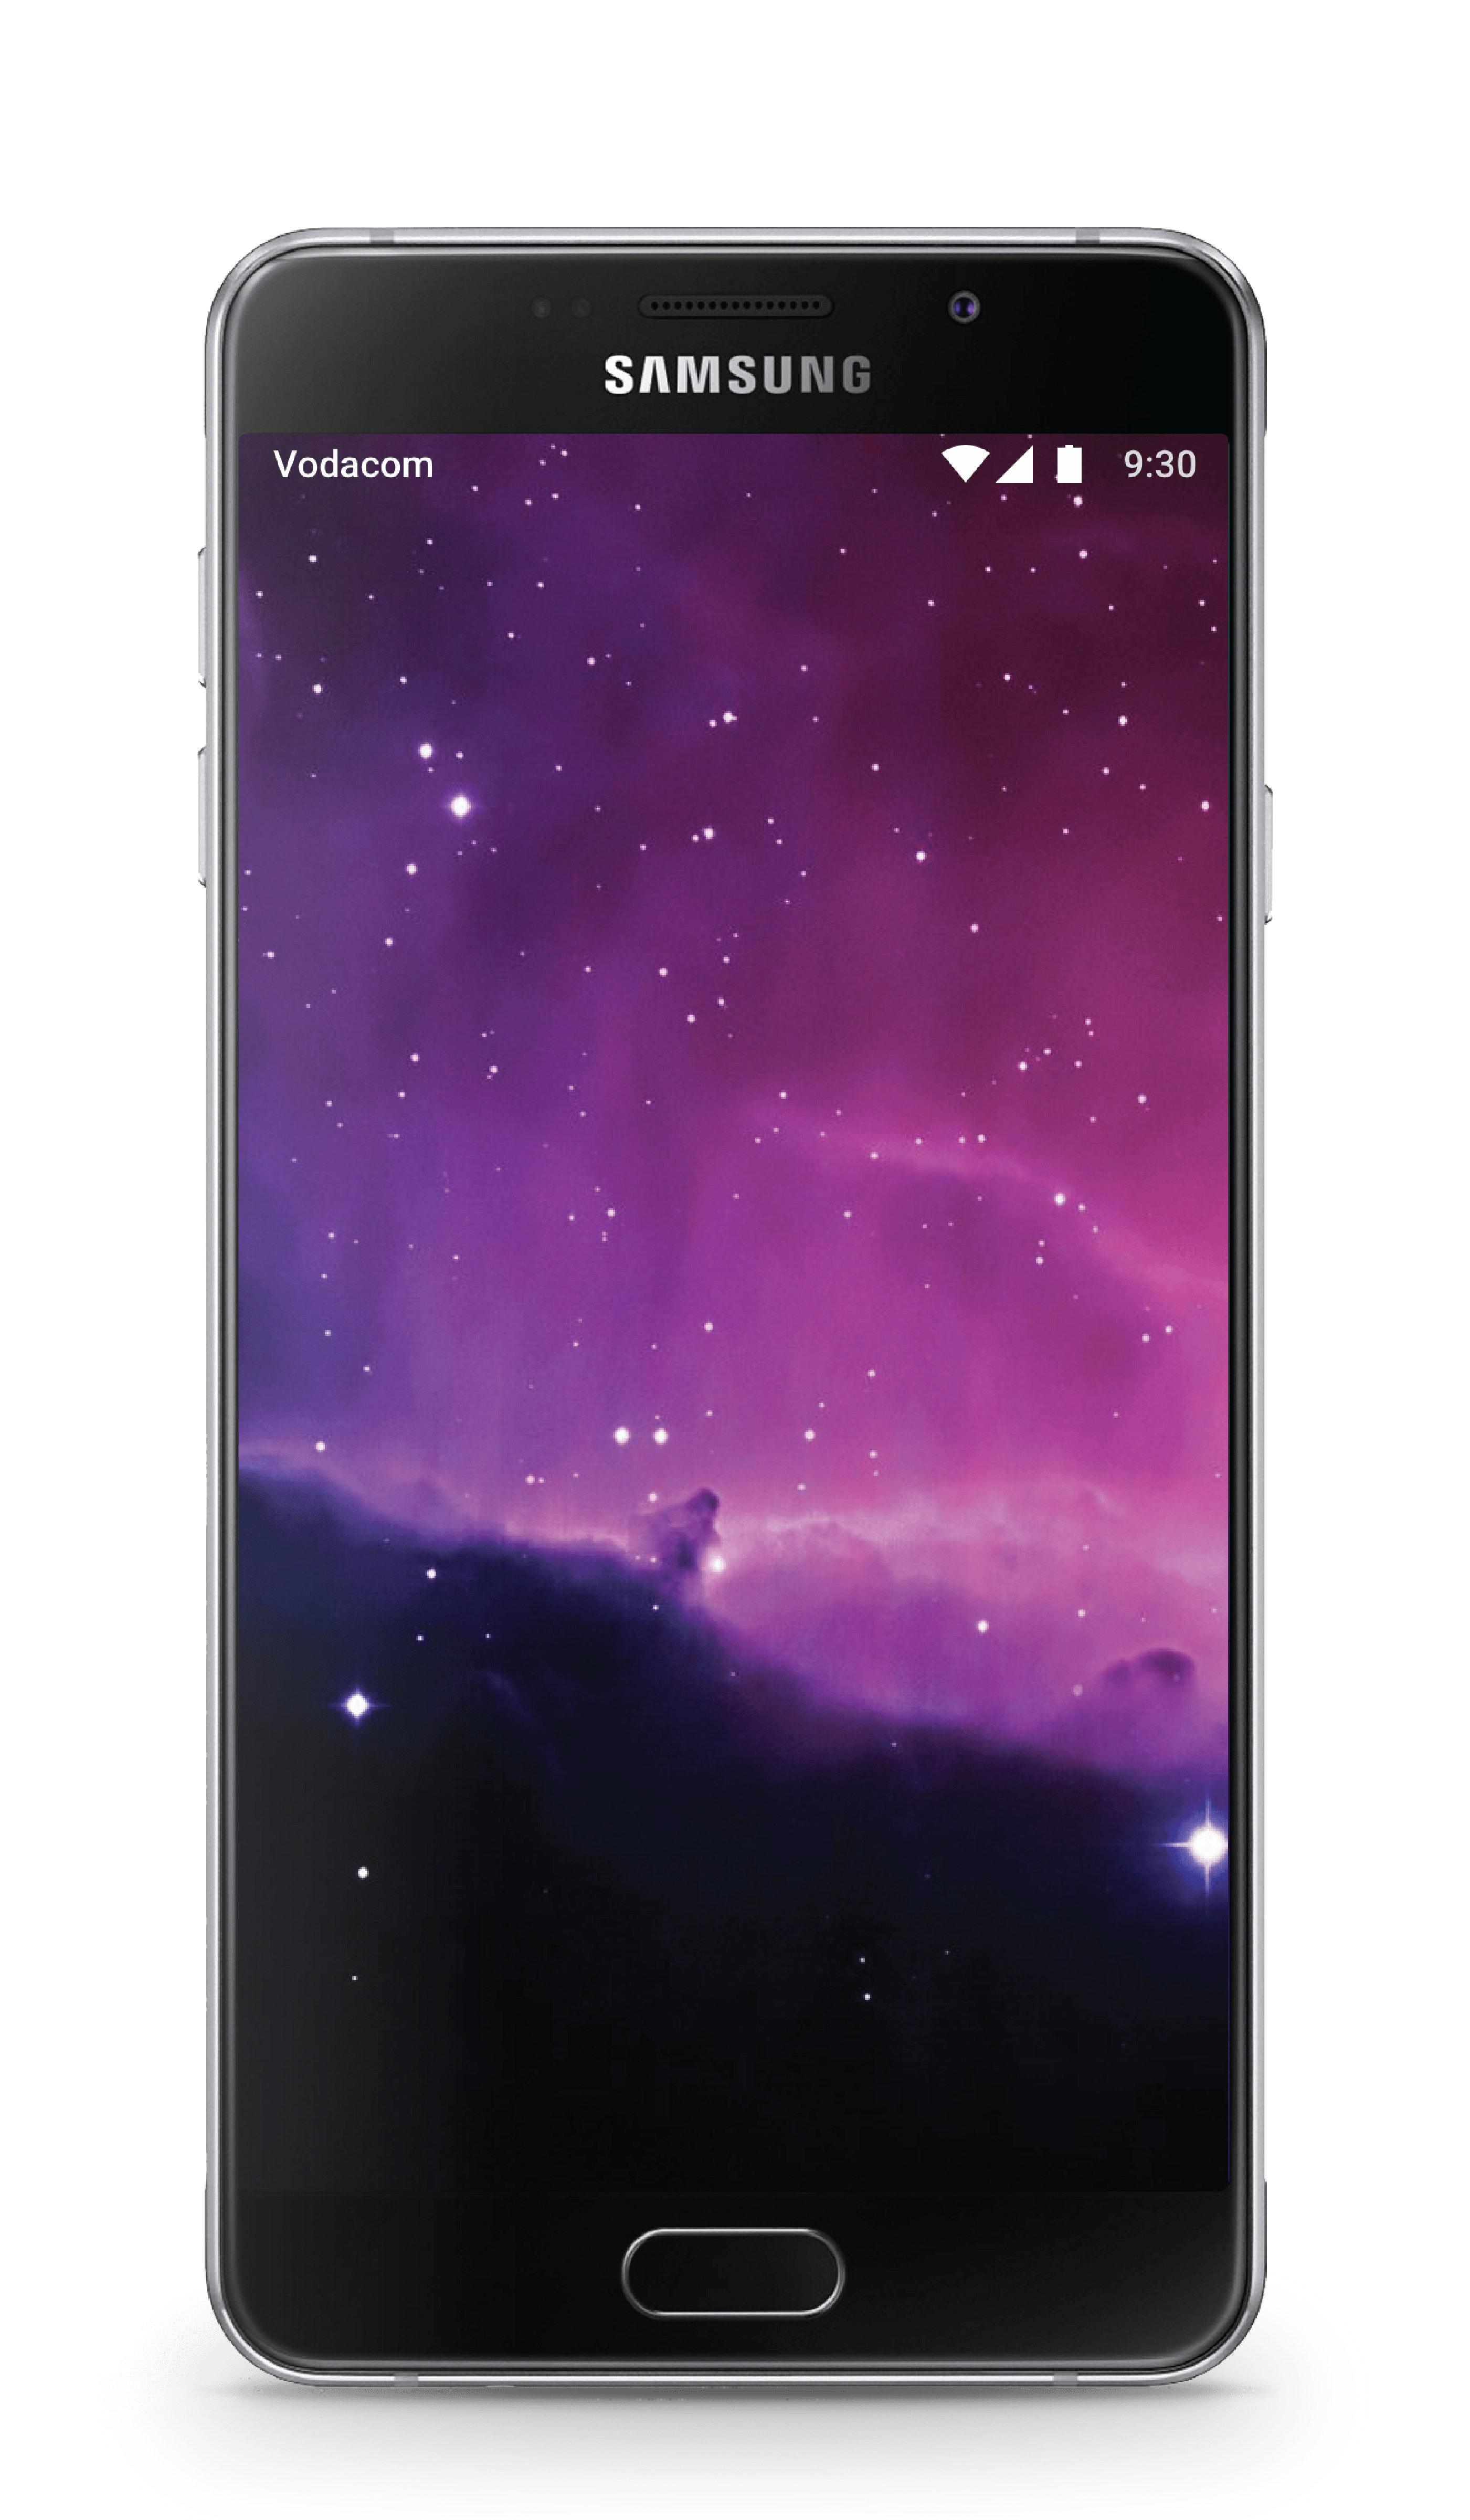 Samsung Galaxy A7 (2016) image